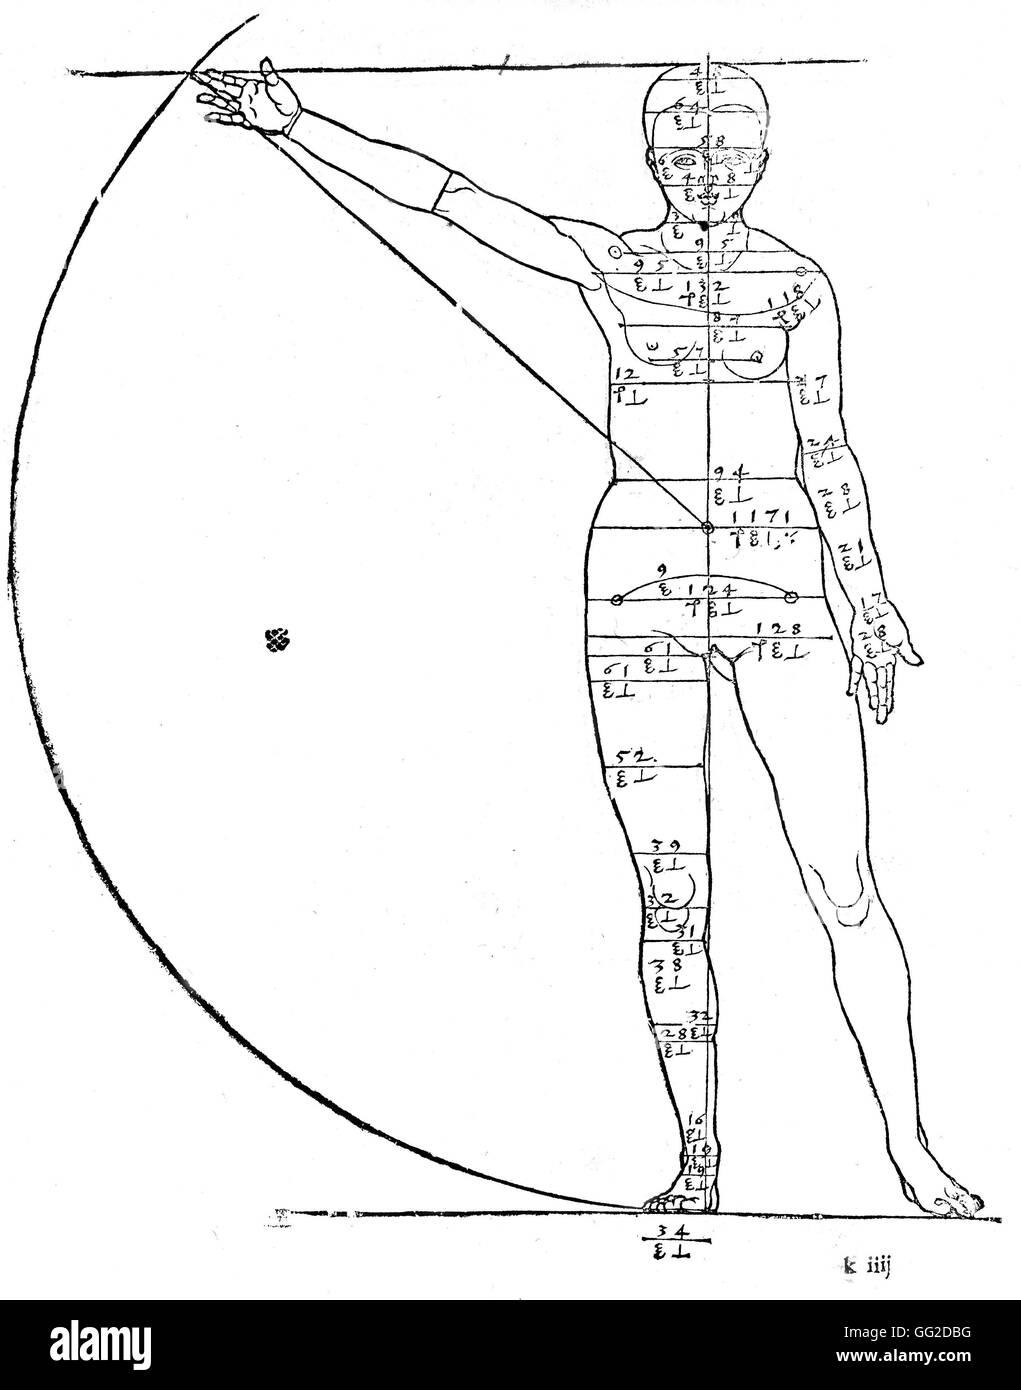 Woman Anatomy Sketch Stock Photos & Woman Anatomy Sketch Stock ...